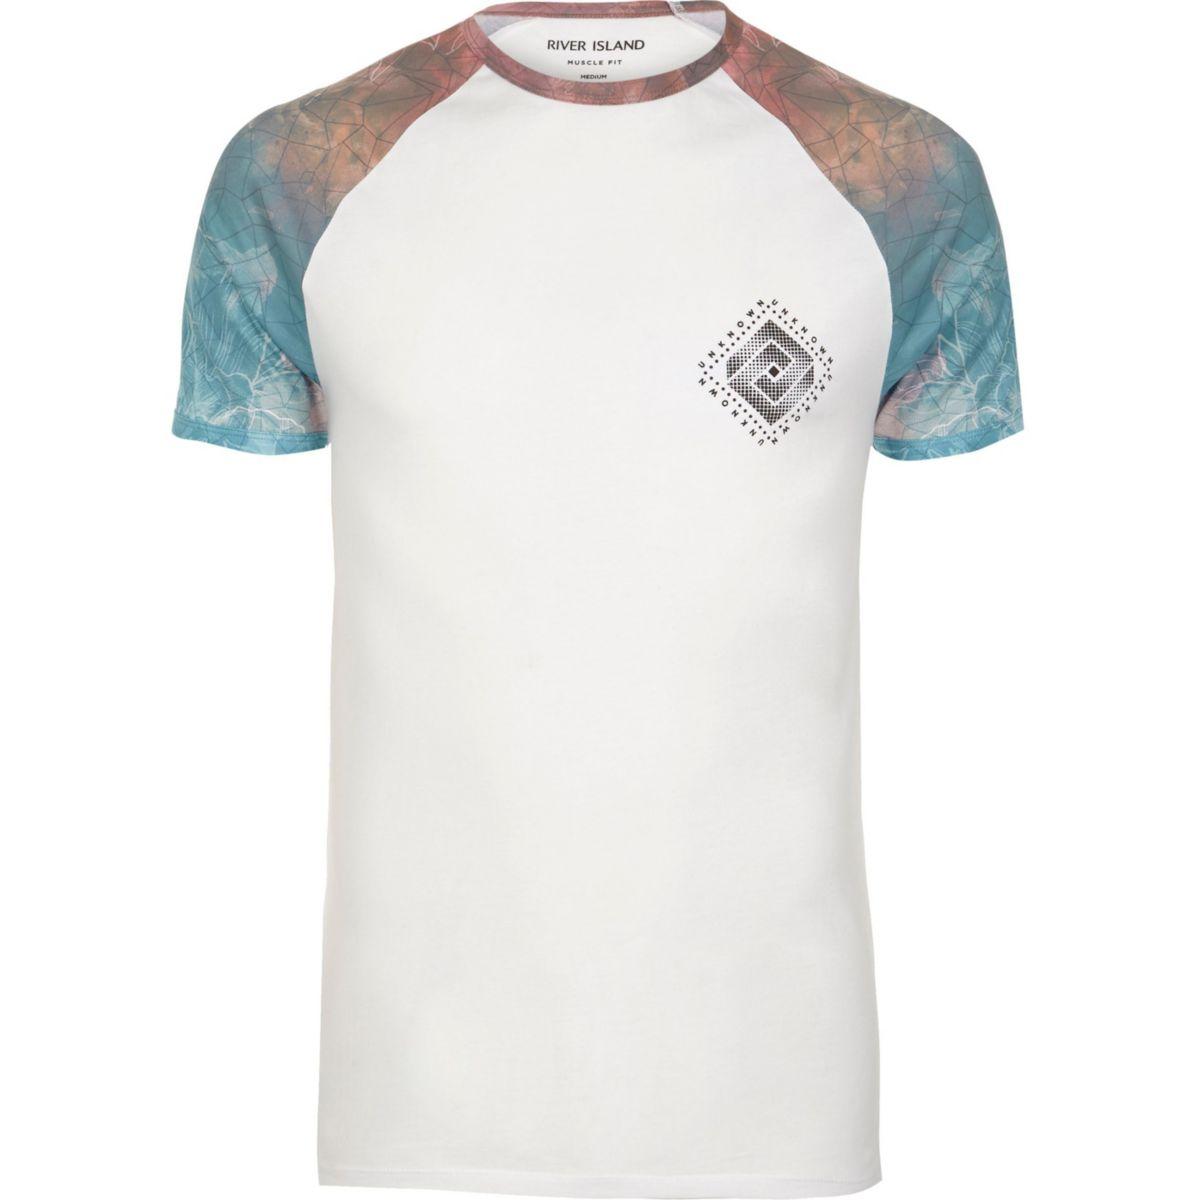 RI Big and Tall - Wit T-shirt met vlekkenprint